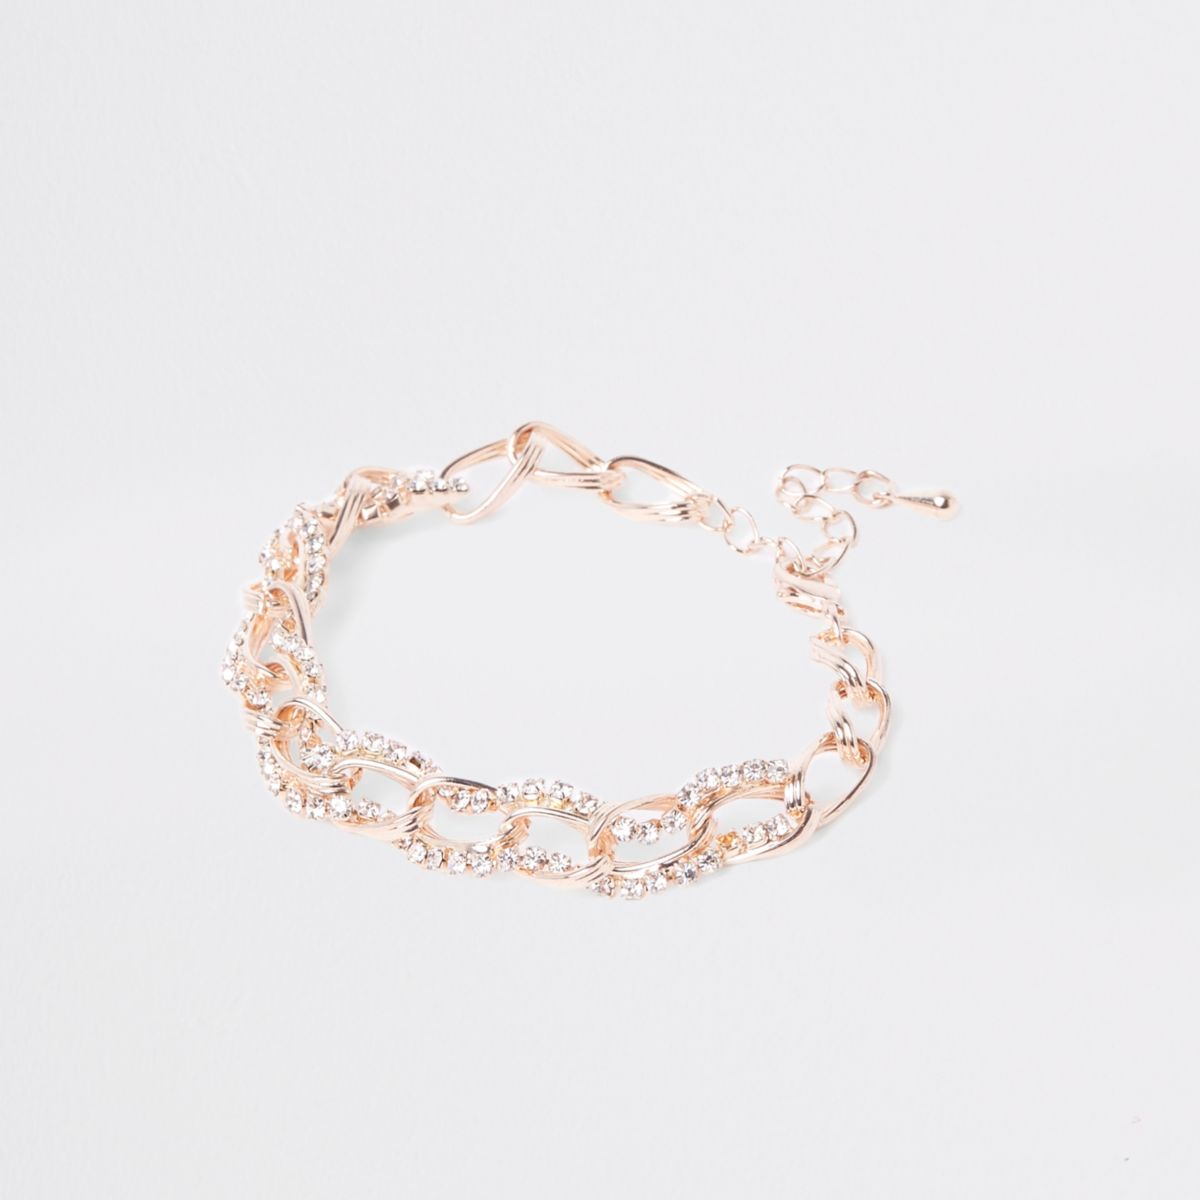 Rose gold rhinestone chain link bracelet